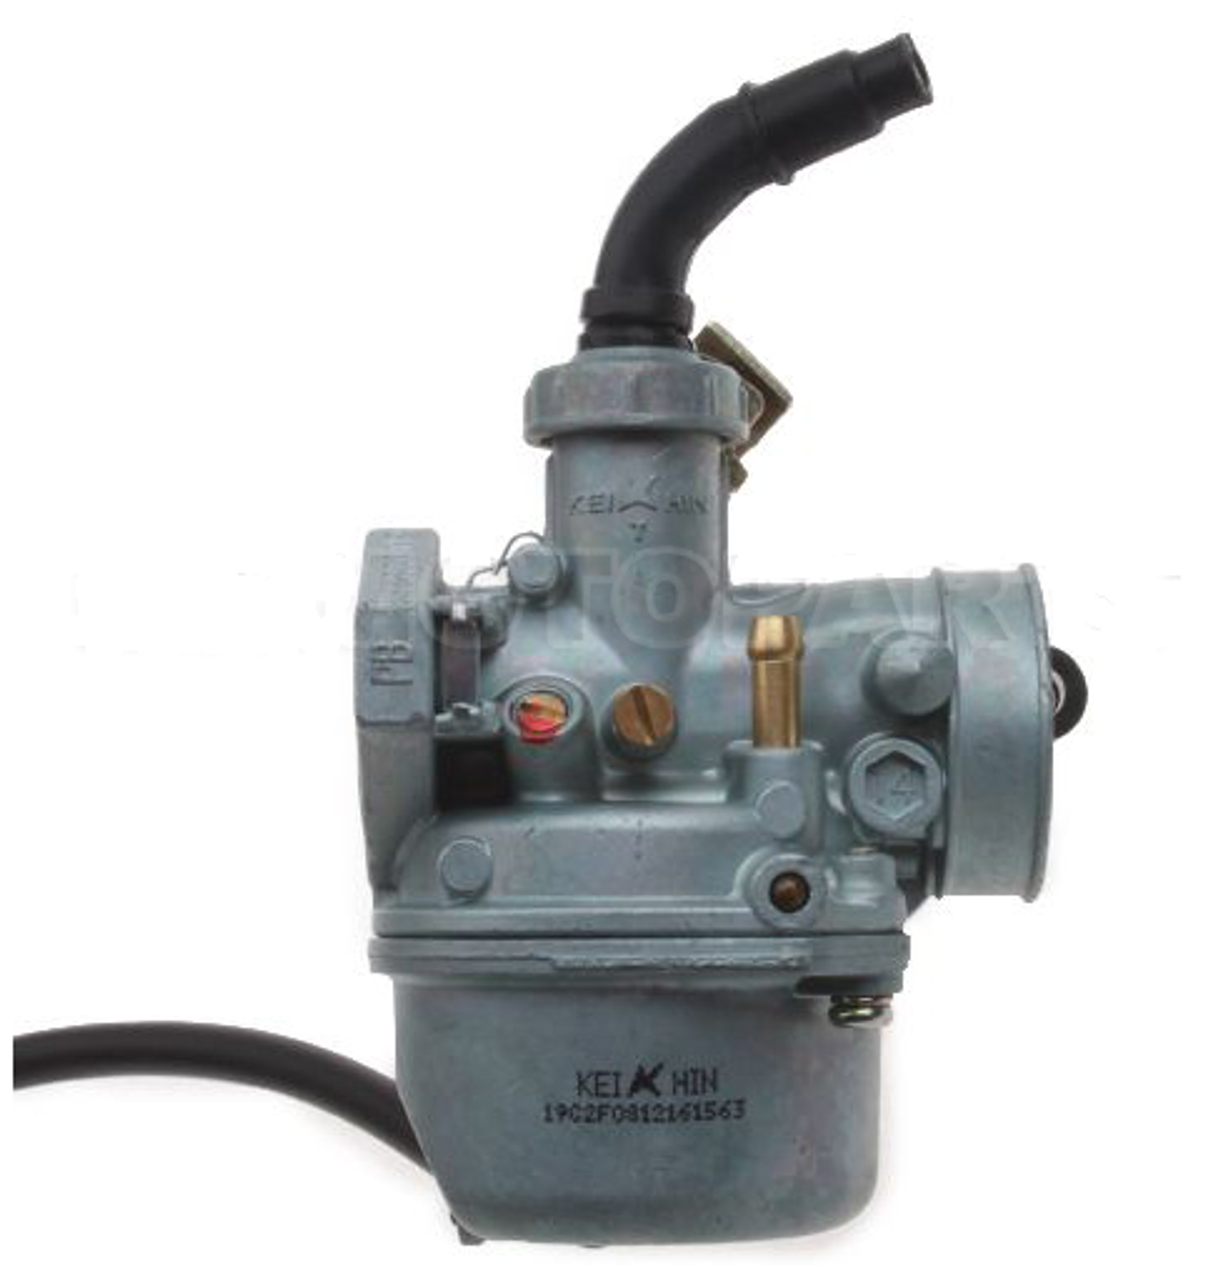 Keihin Tuneable Taotao Coolster GoKart Carburetor Upgrade w/choke cable  mount